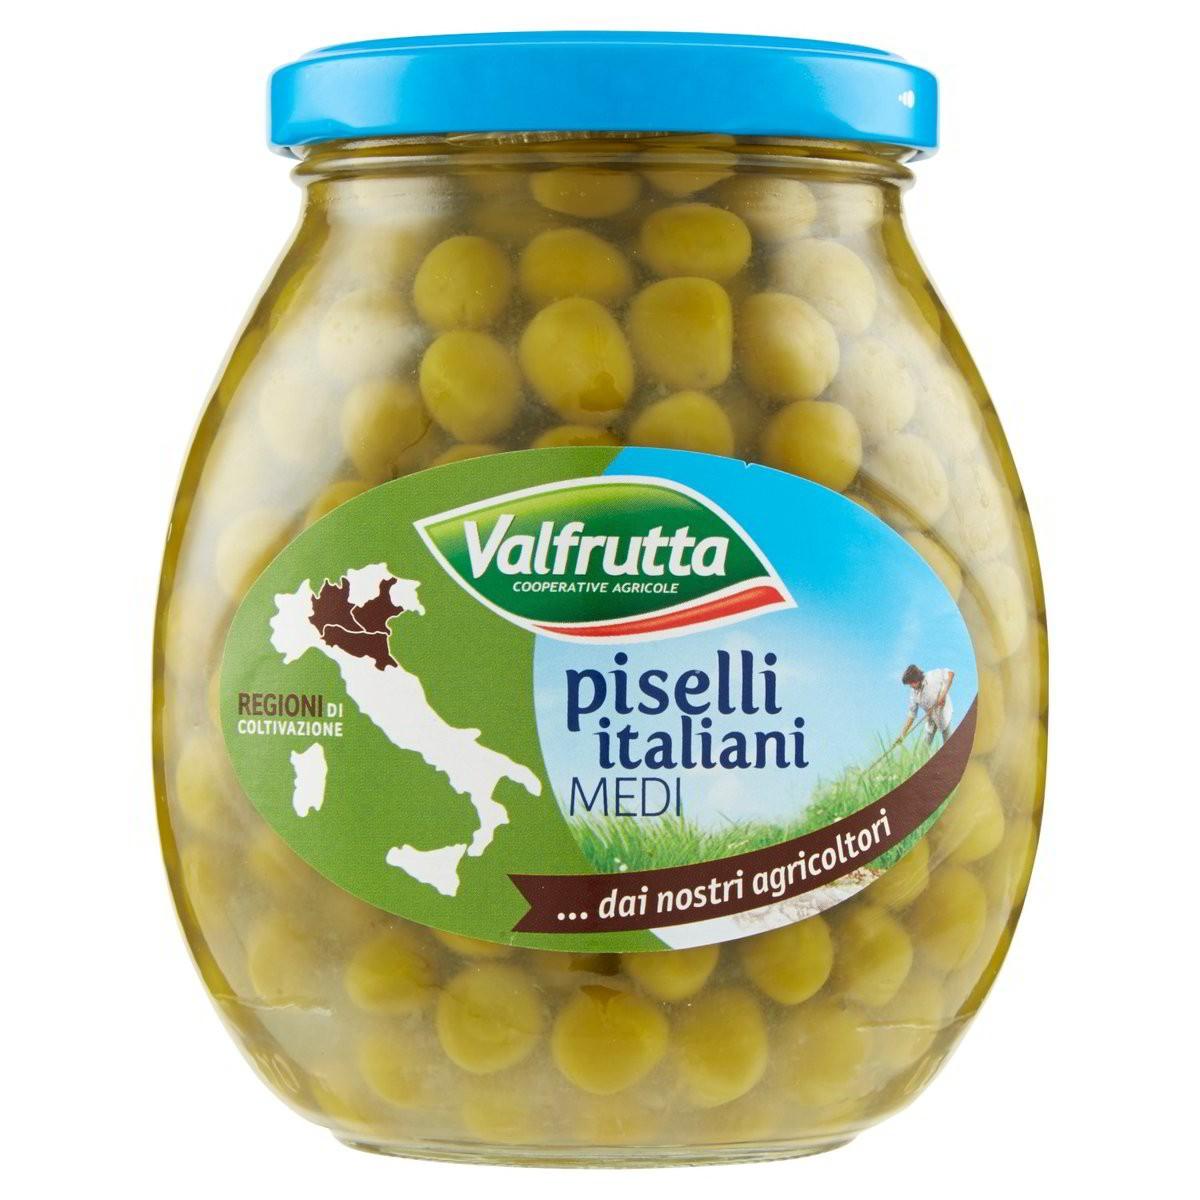 Valfrutta Piselli italiani medi